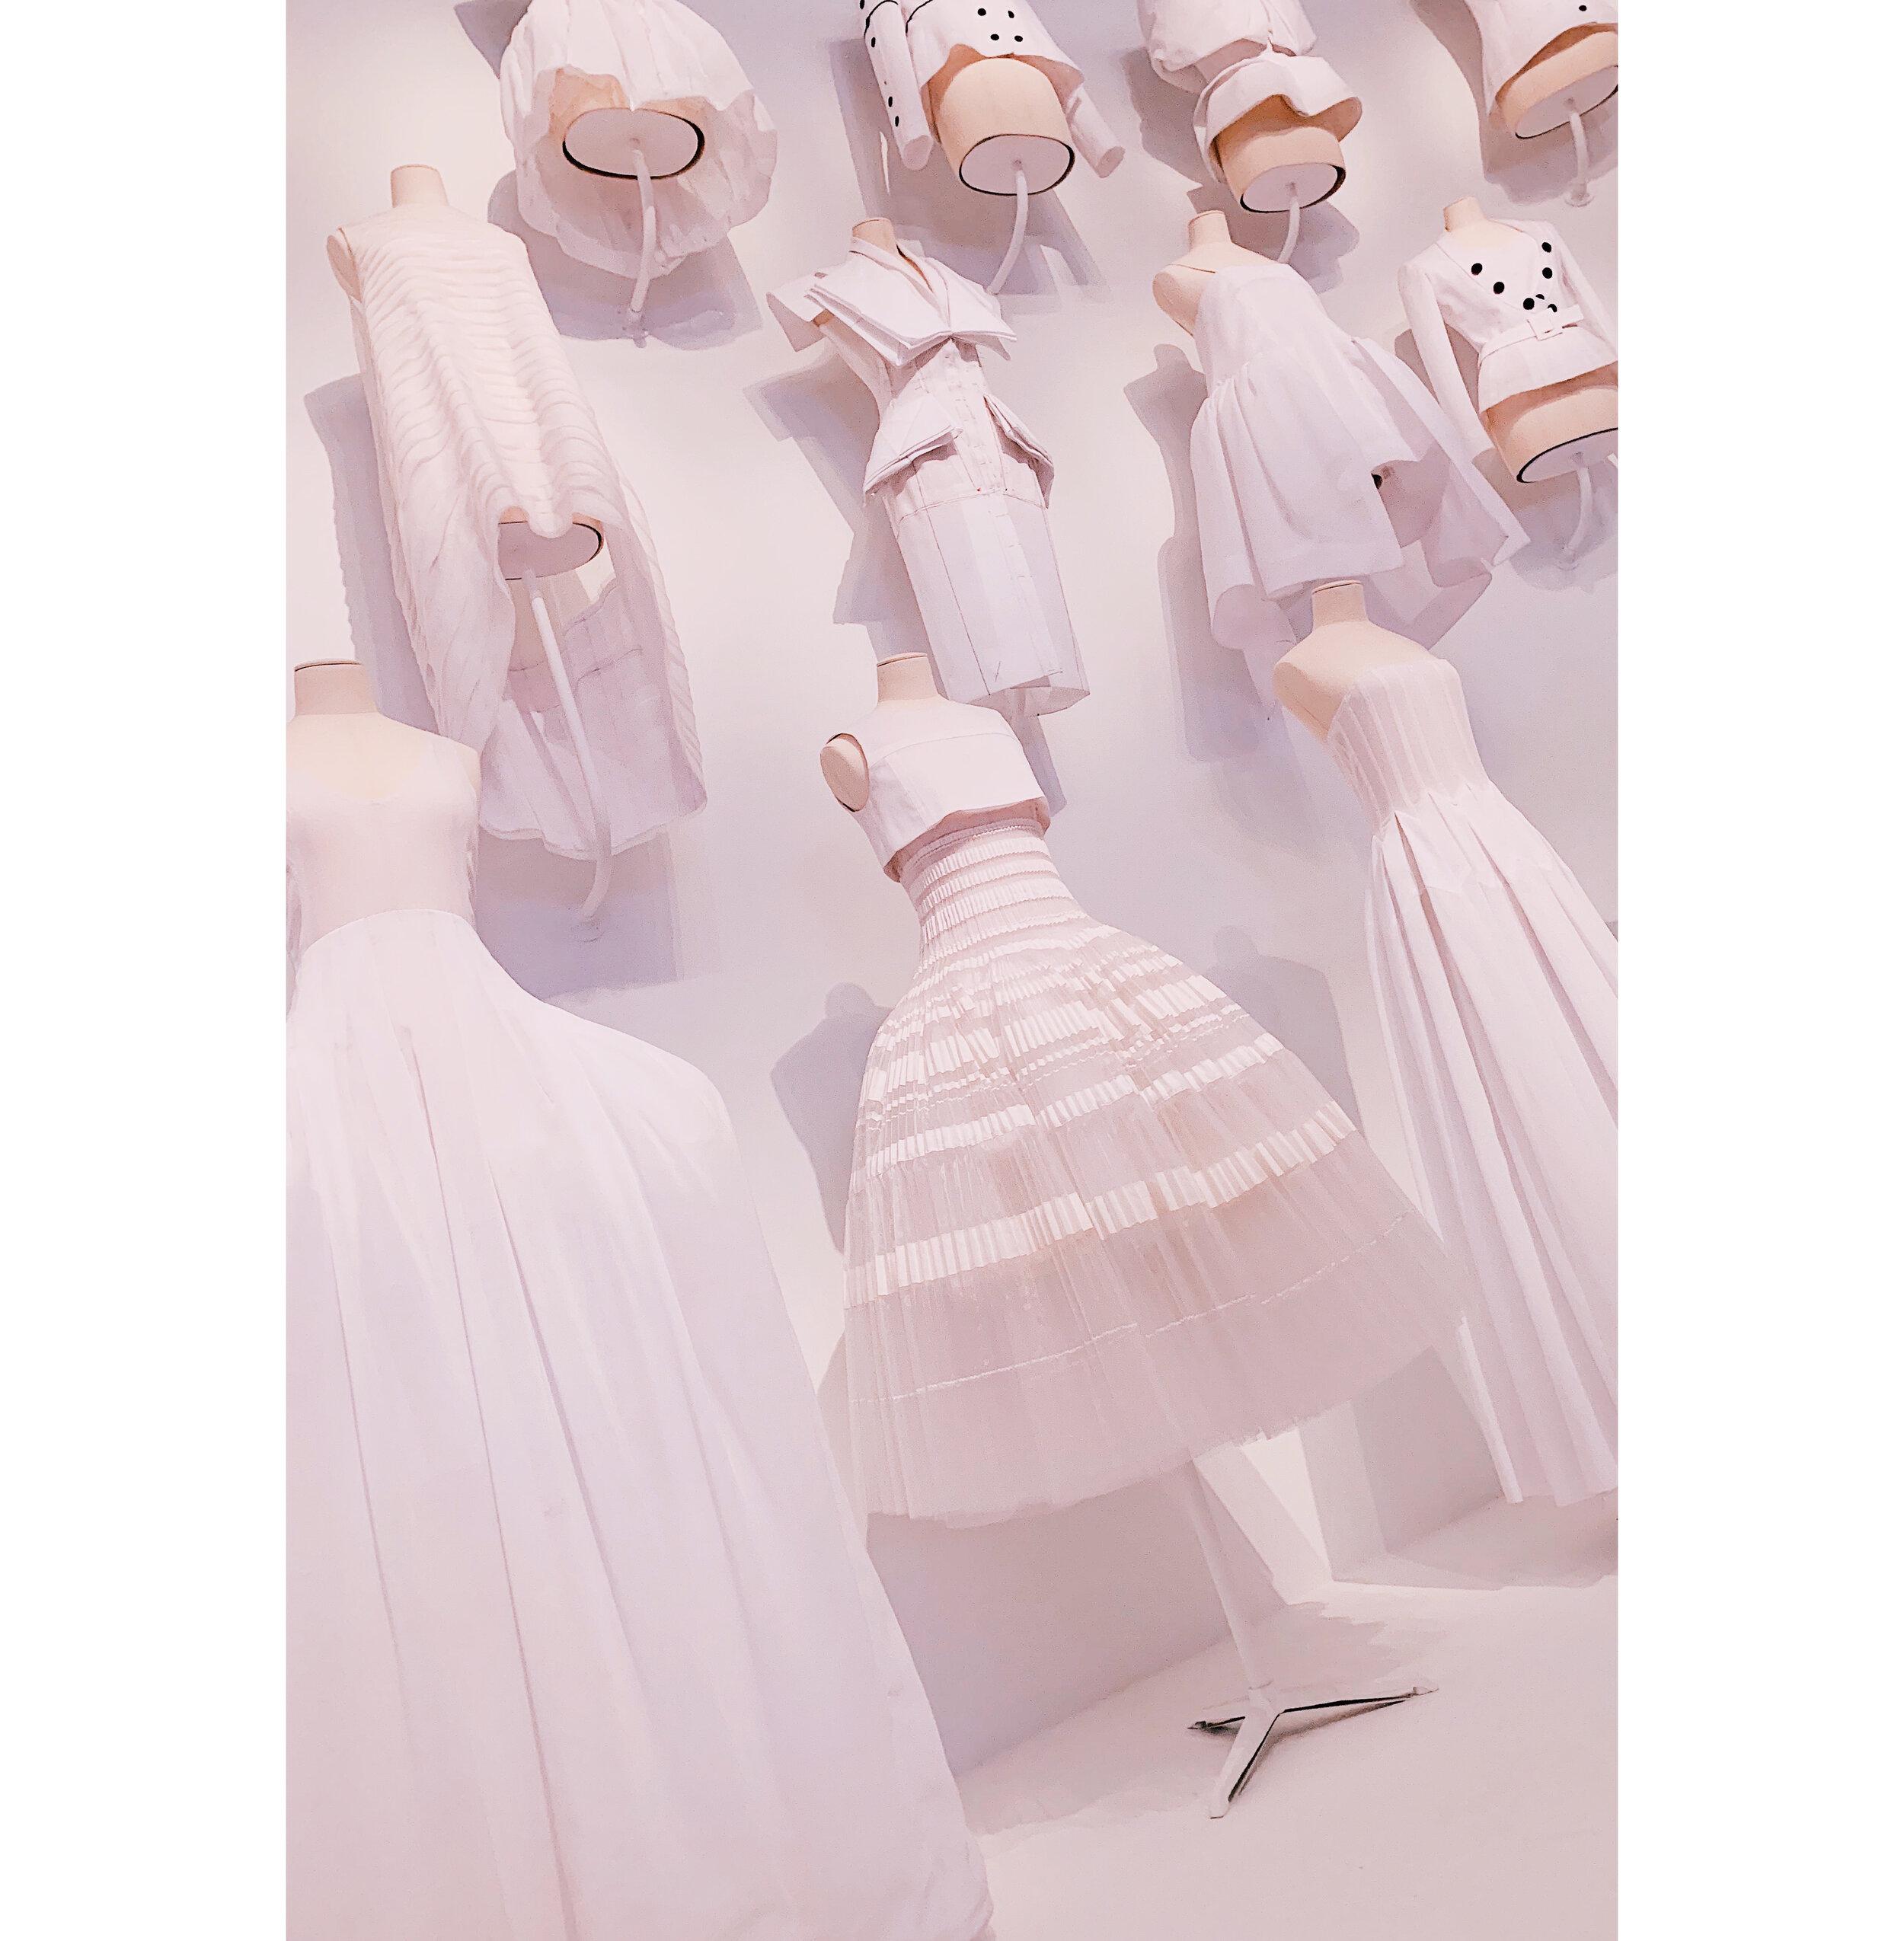 Dior Show 3.jpg